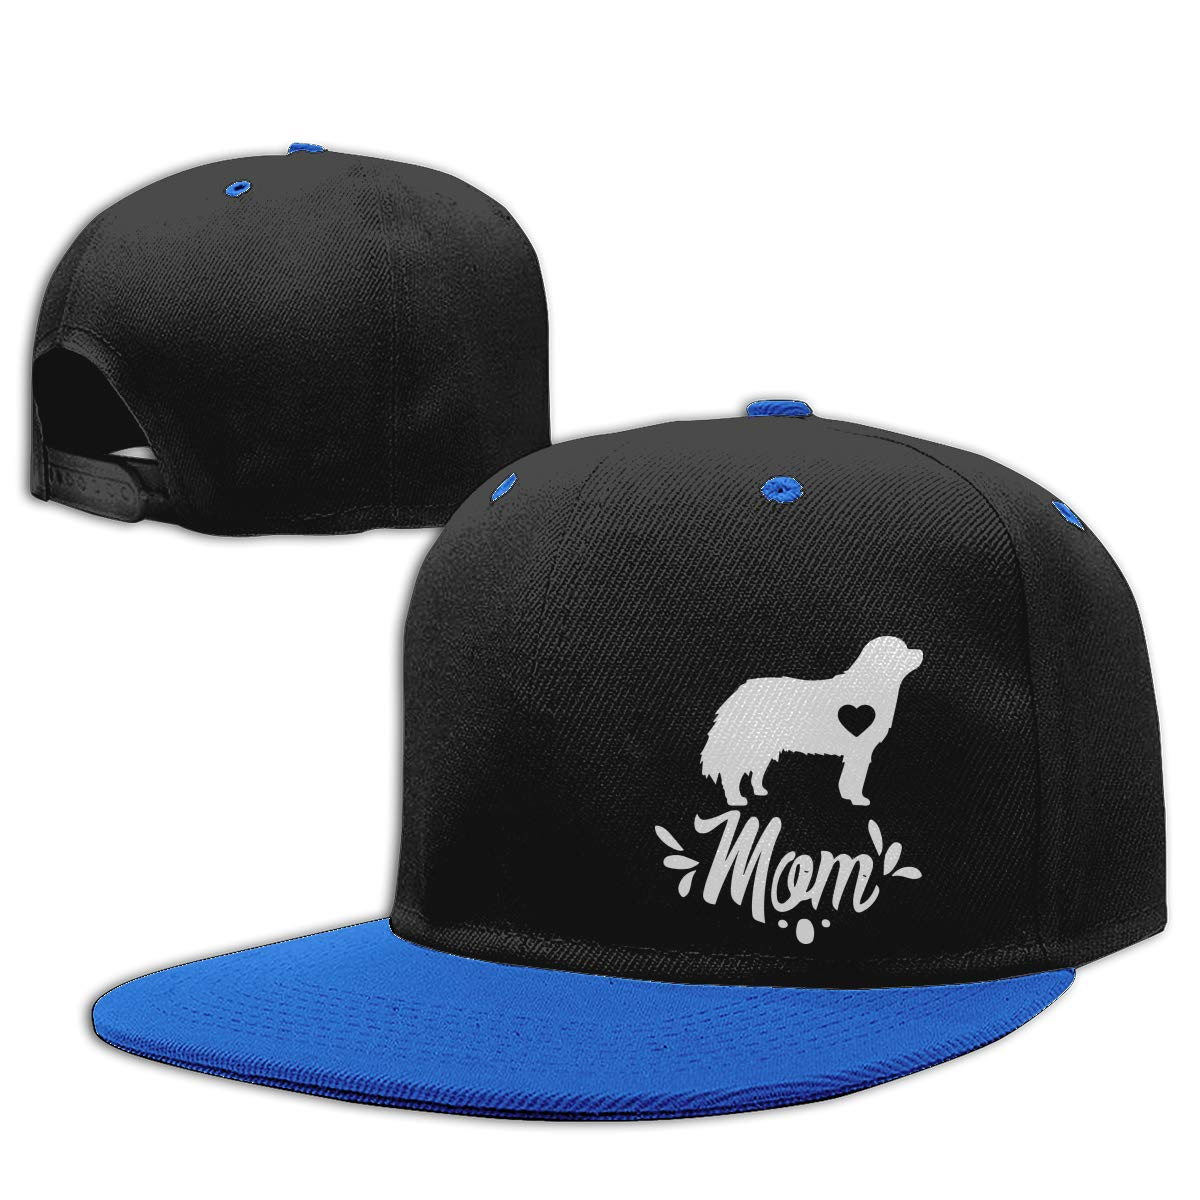 Bernese Mountain Dog Mom Unisex Hip Hop Baseball Caps NMG-01 Men Womens Plain Cap